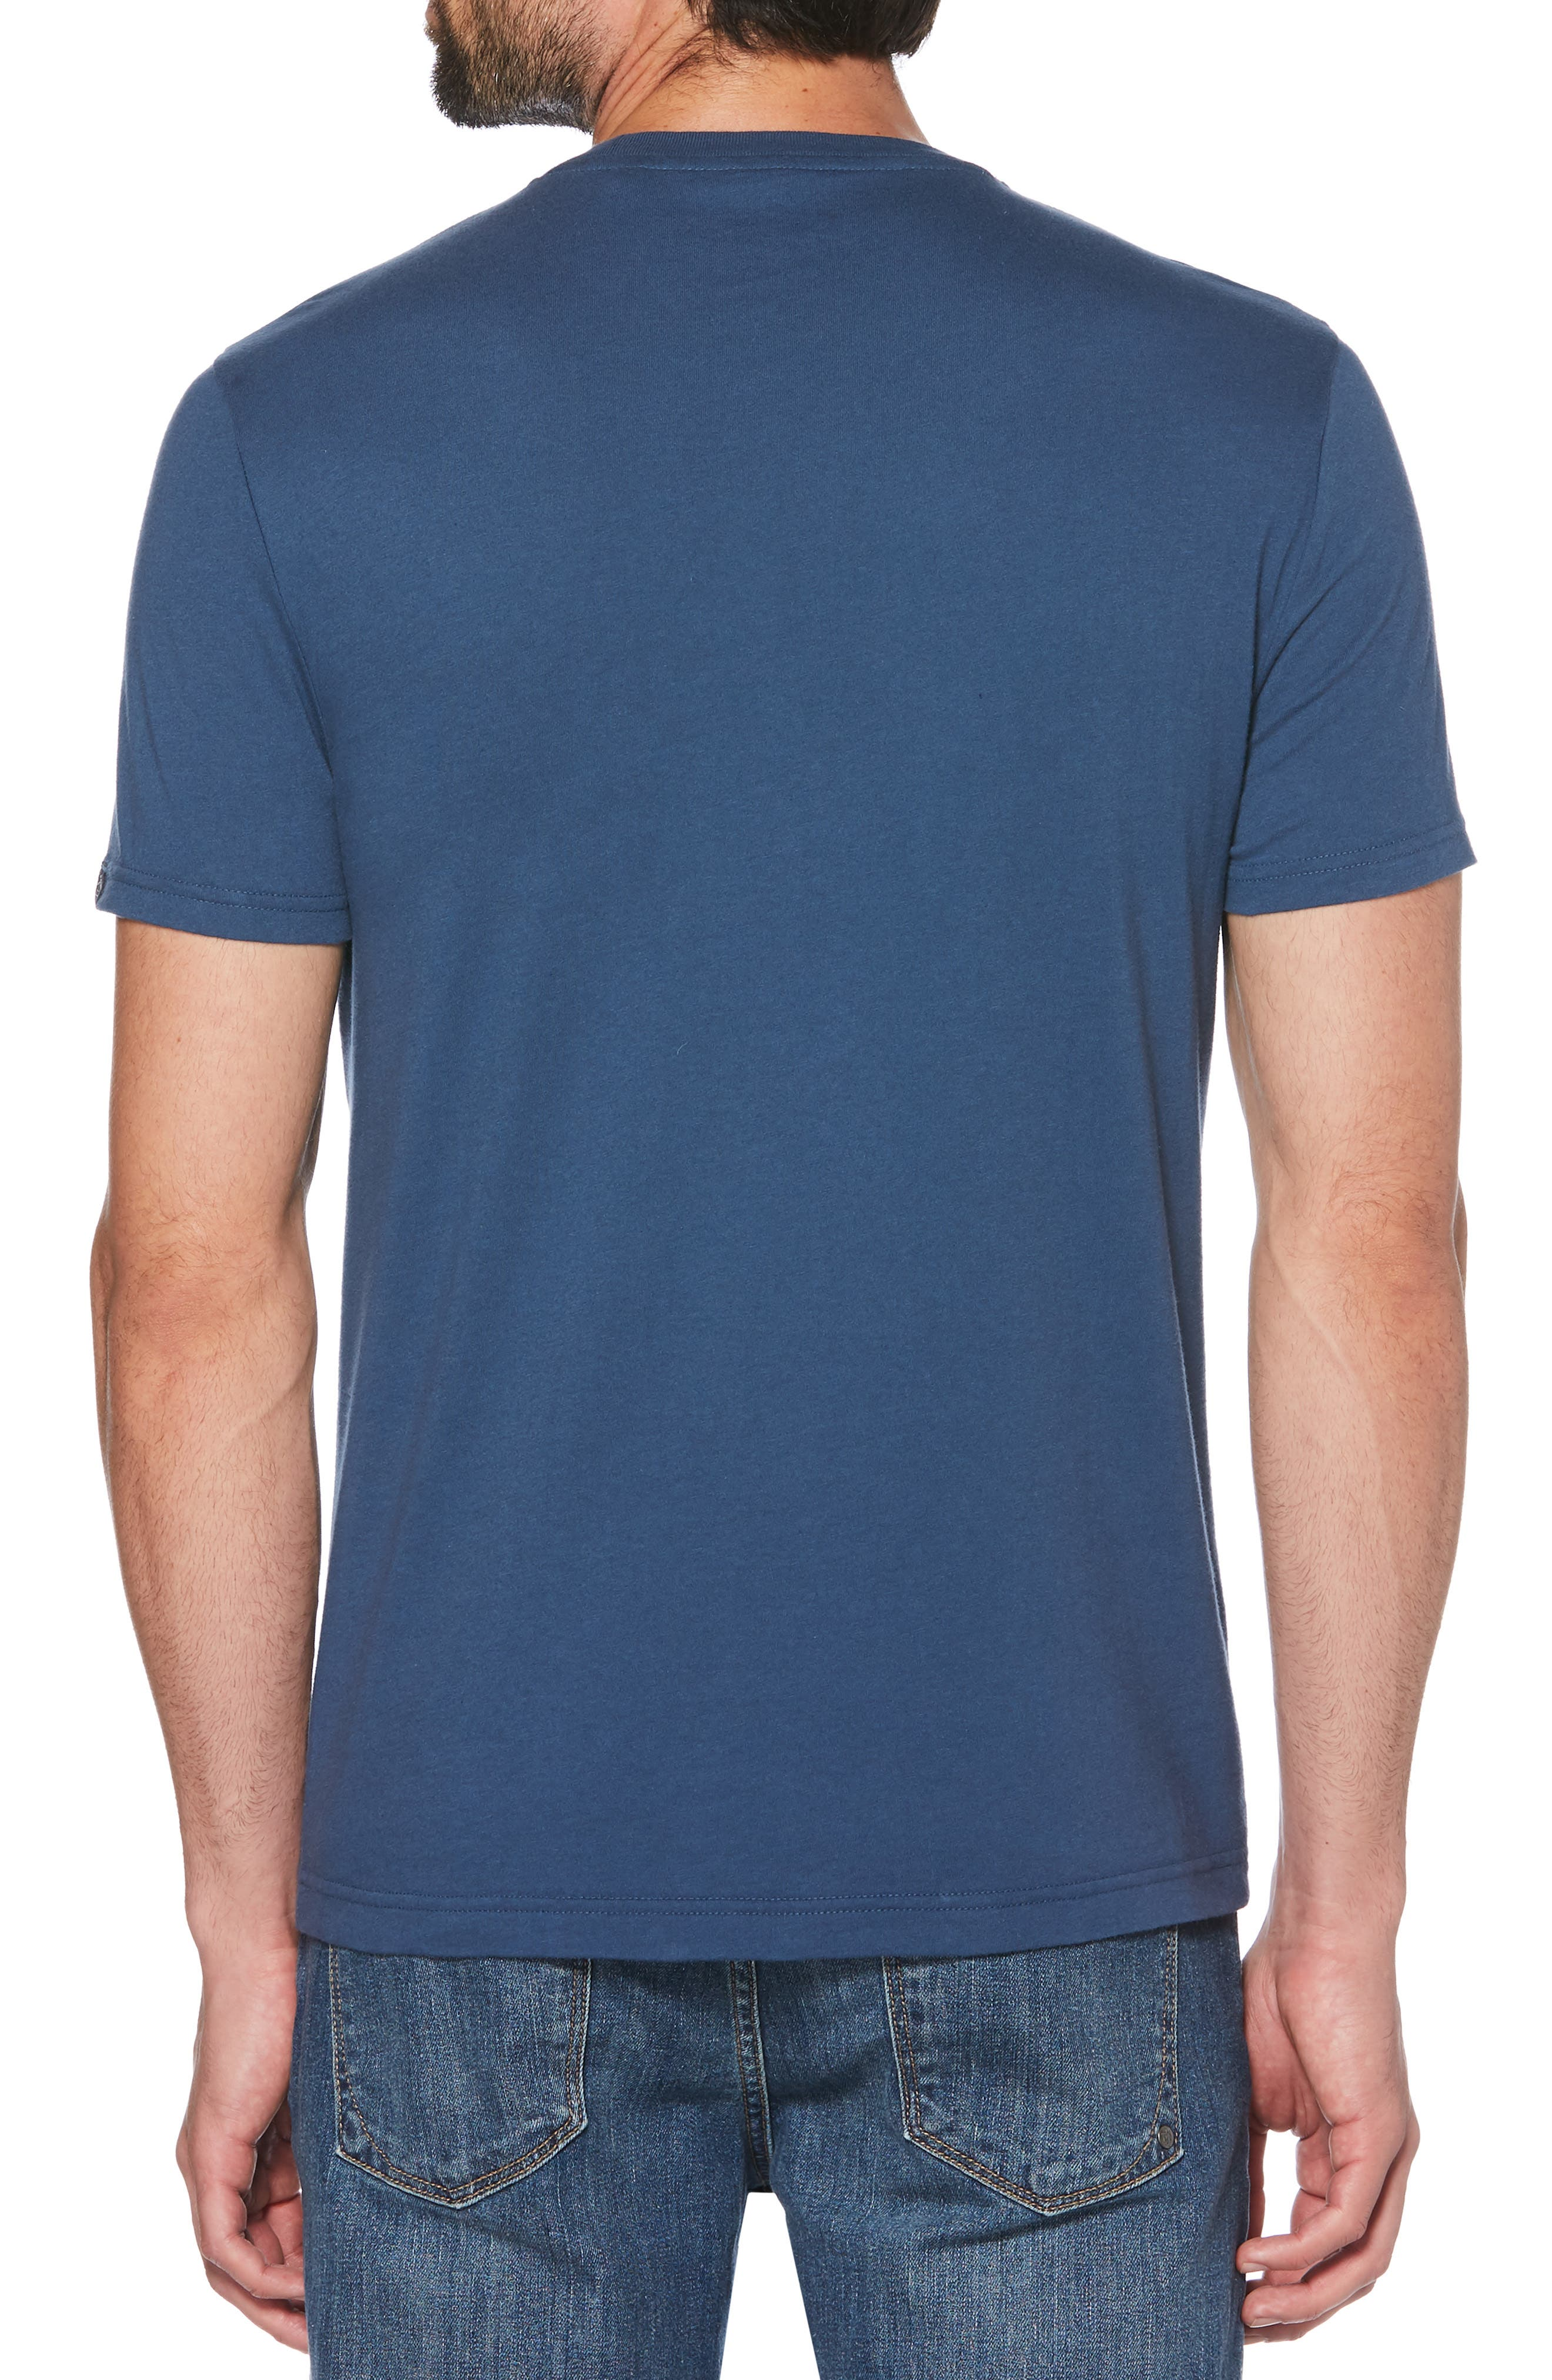 ORIGINAL PENGUIN, Leafy Infill Pete T-Shirt, Alternate thumbnail 2, color, DARK DENIM